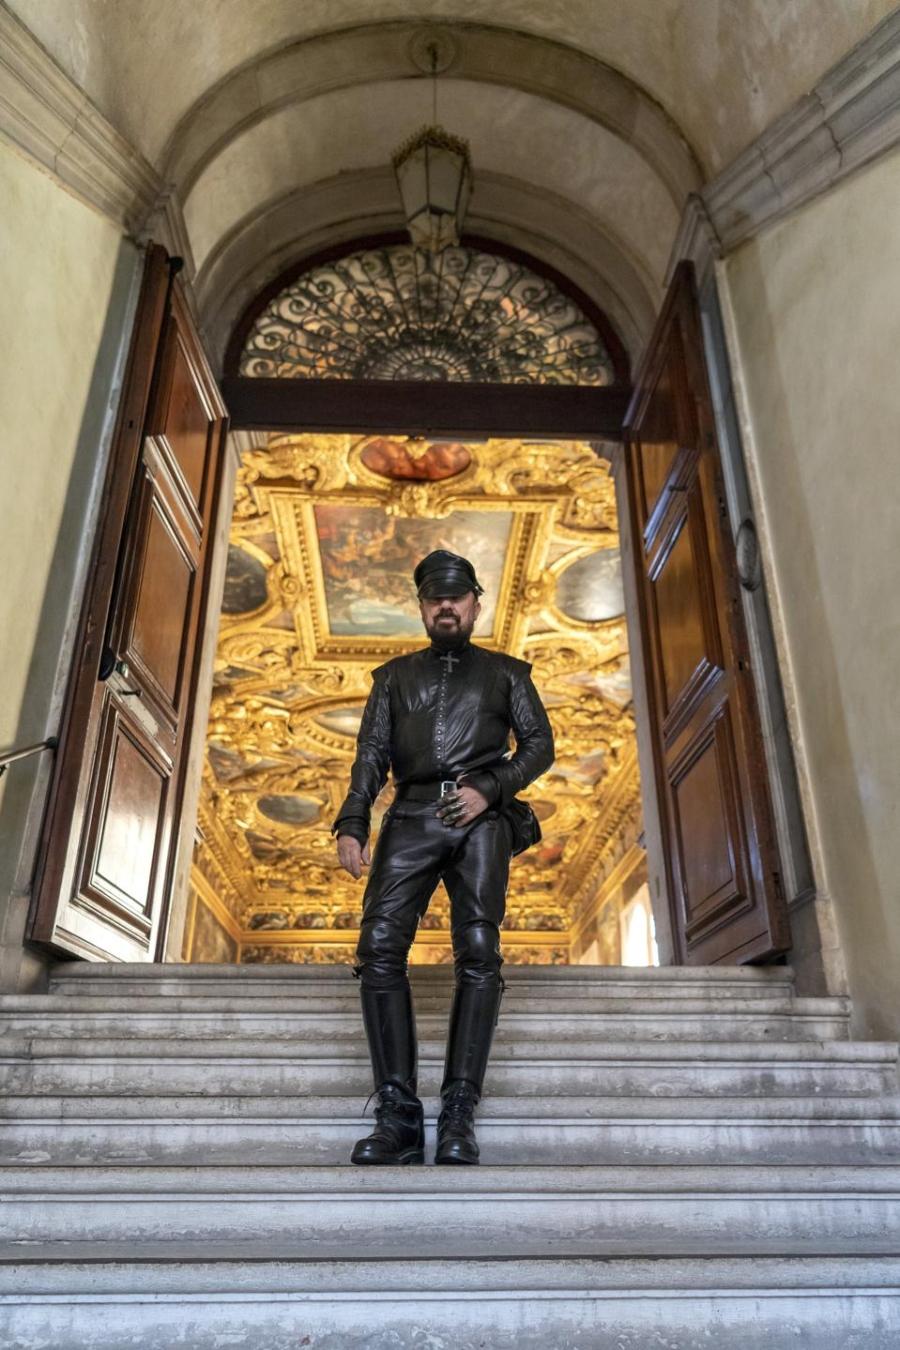 Peter Marino The Way To Turn Luxury Fashion Stores Into Art_1 peter marino Peter Marino: The Way To Turn Luxury Fashion Stores Into Art Peter Marino The Way To Turn Luxury Fashion Stores Into Art 1